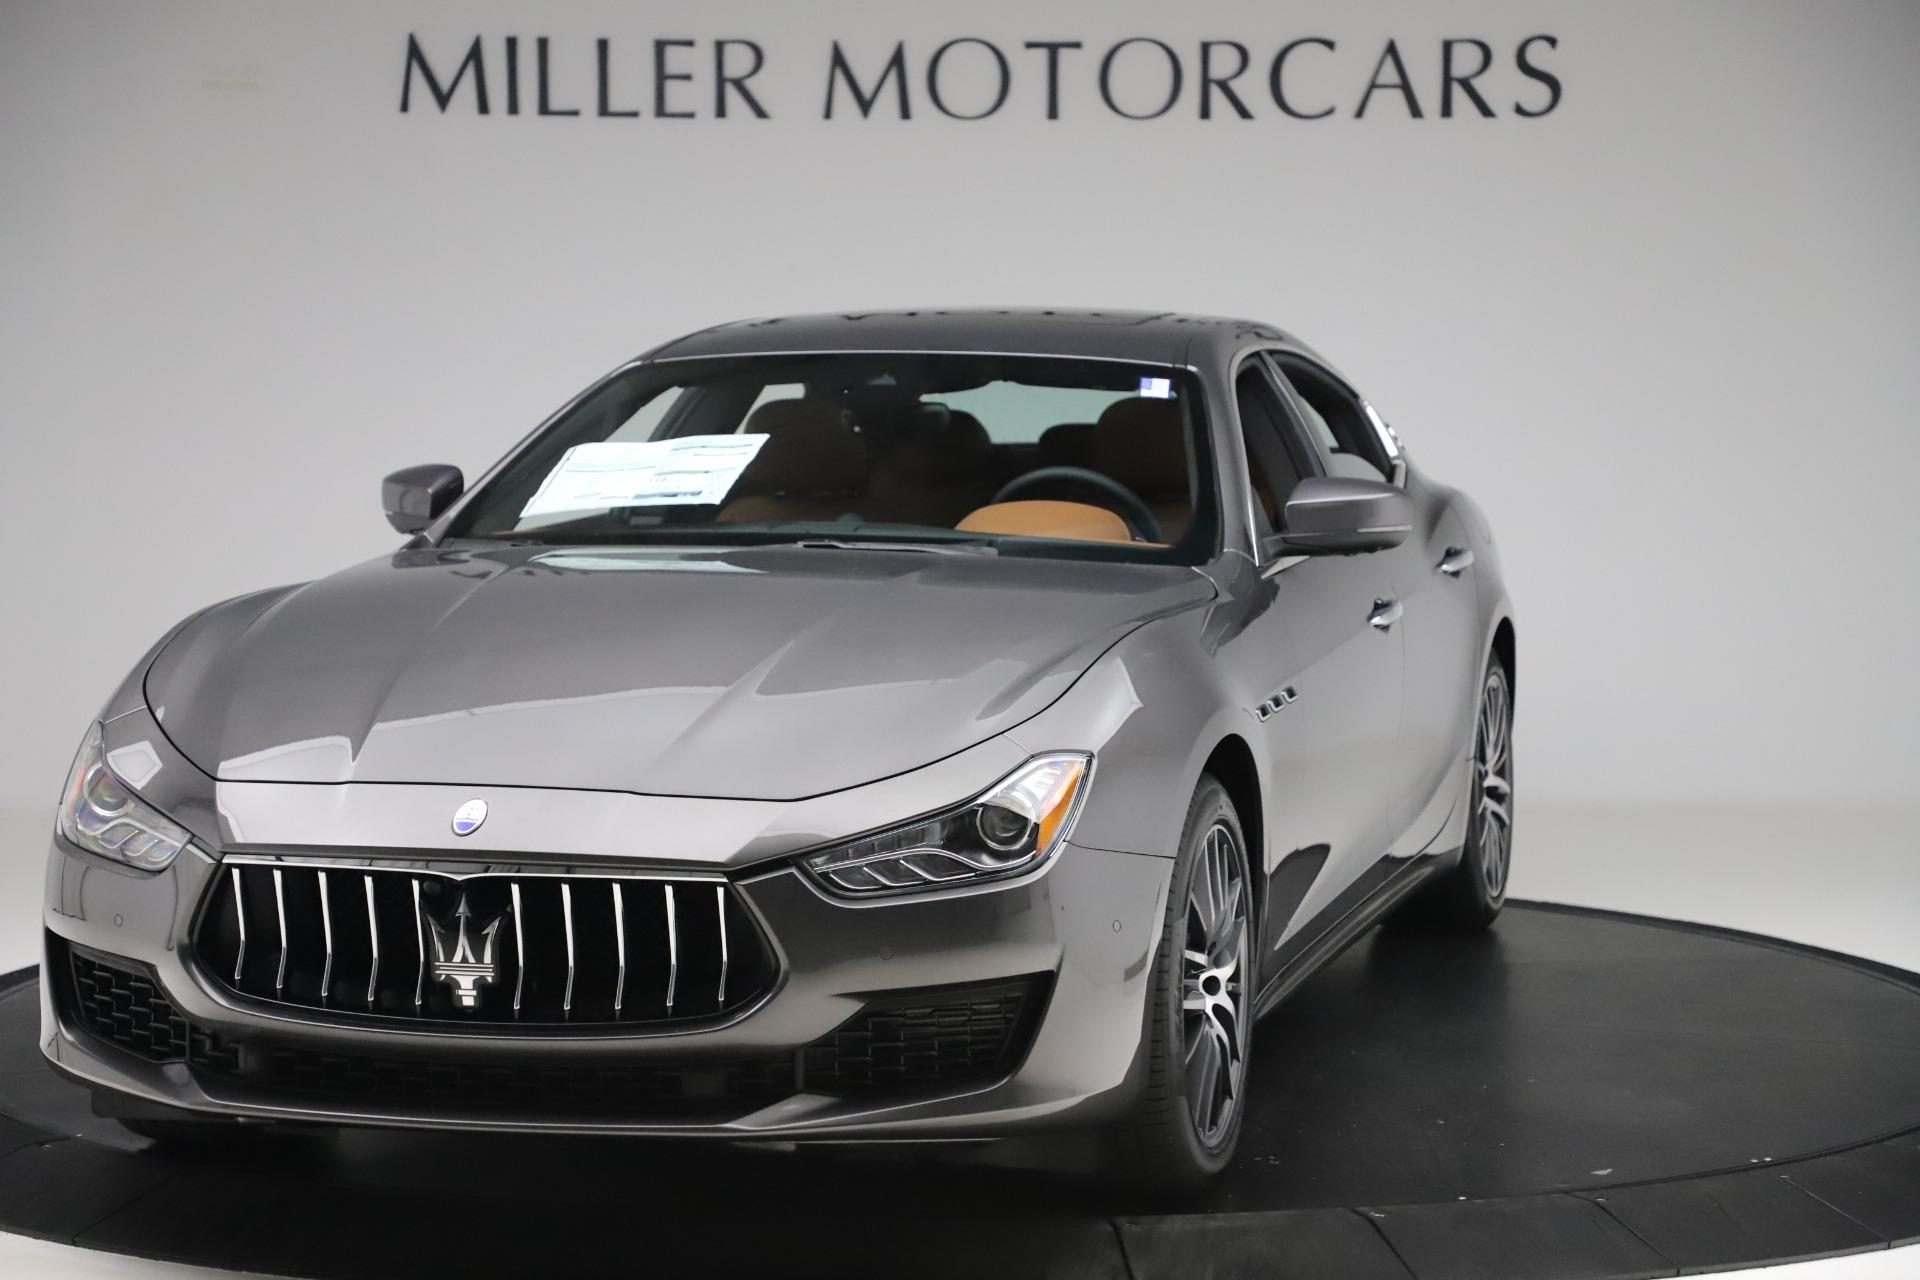 New 2020 Maserati Ghibli S Q4 for sale $86,285 at Rolls-Royce Motor Cars Greenwich in Greenwich CT 06830 1